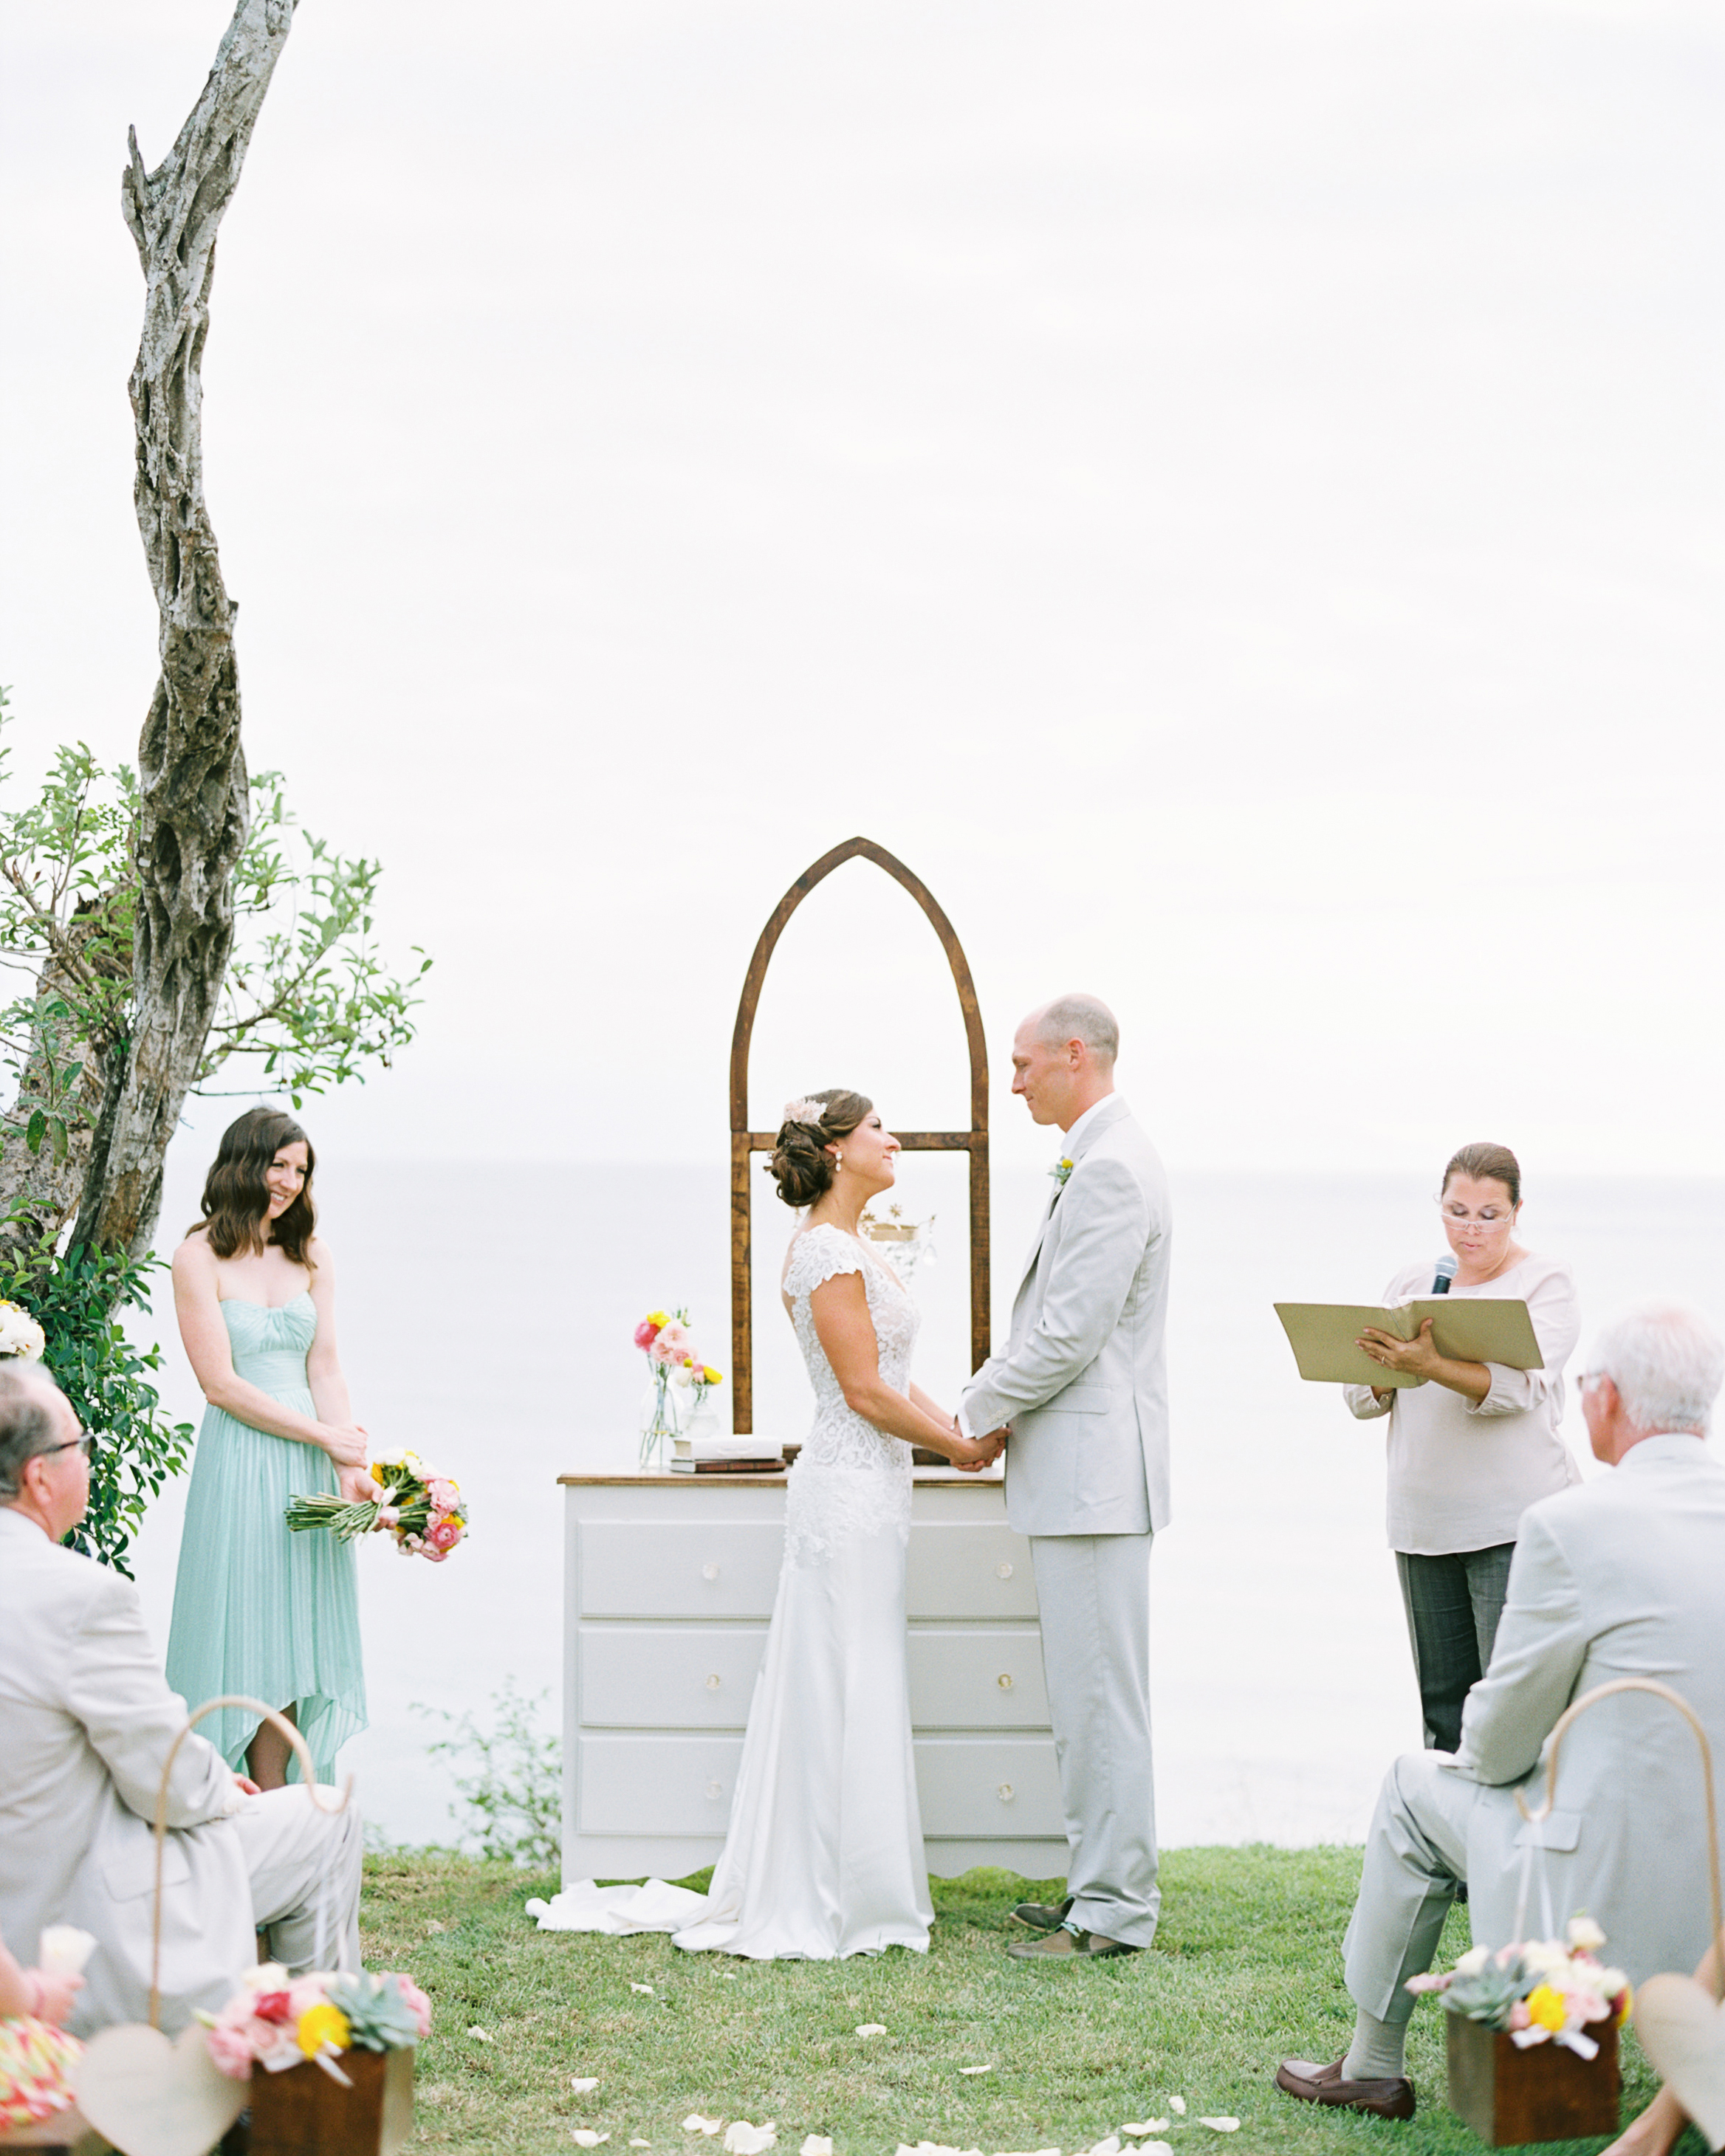 molly-nate-wedding-ceremony-169-s111479-0814.jpg